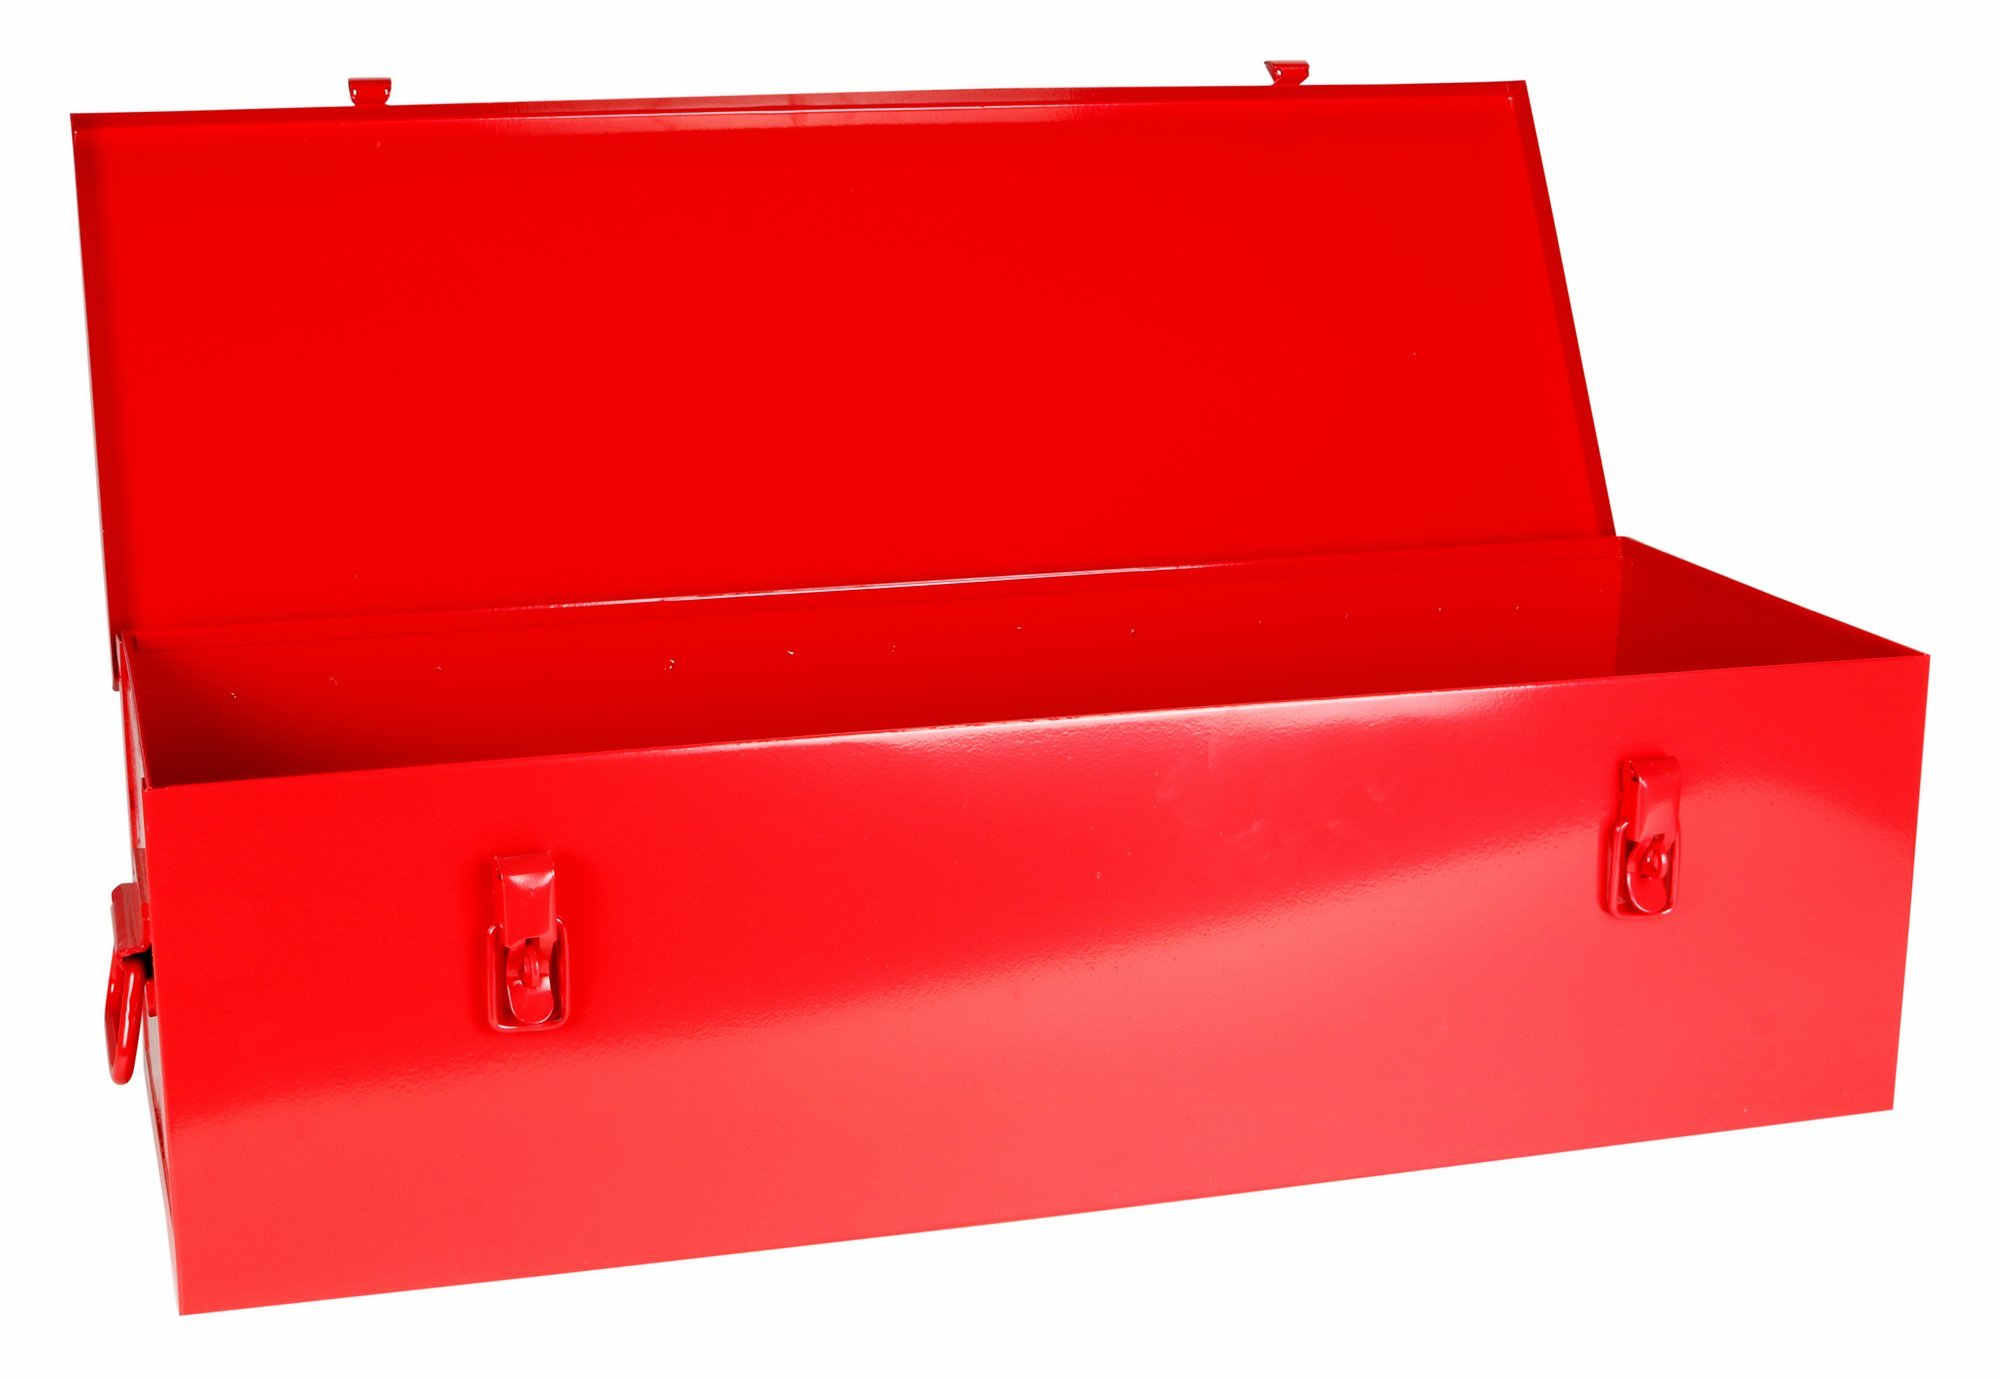 Toledo Pipe 42950 700 Power Drive Metal Carrying Case fits RIDGID 700 41935 B-171-X